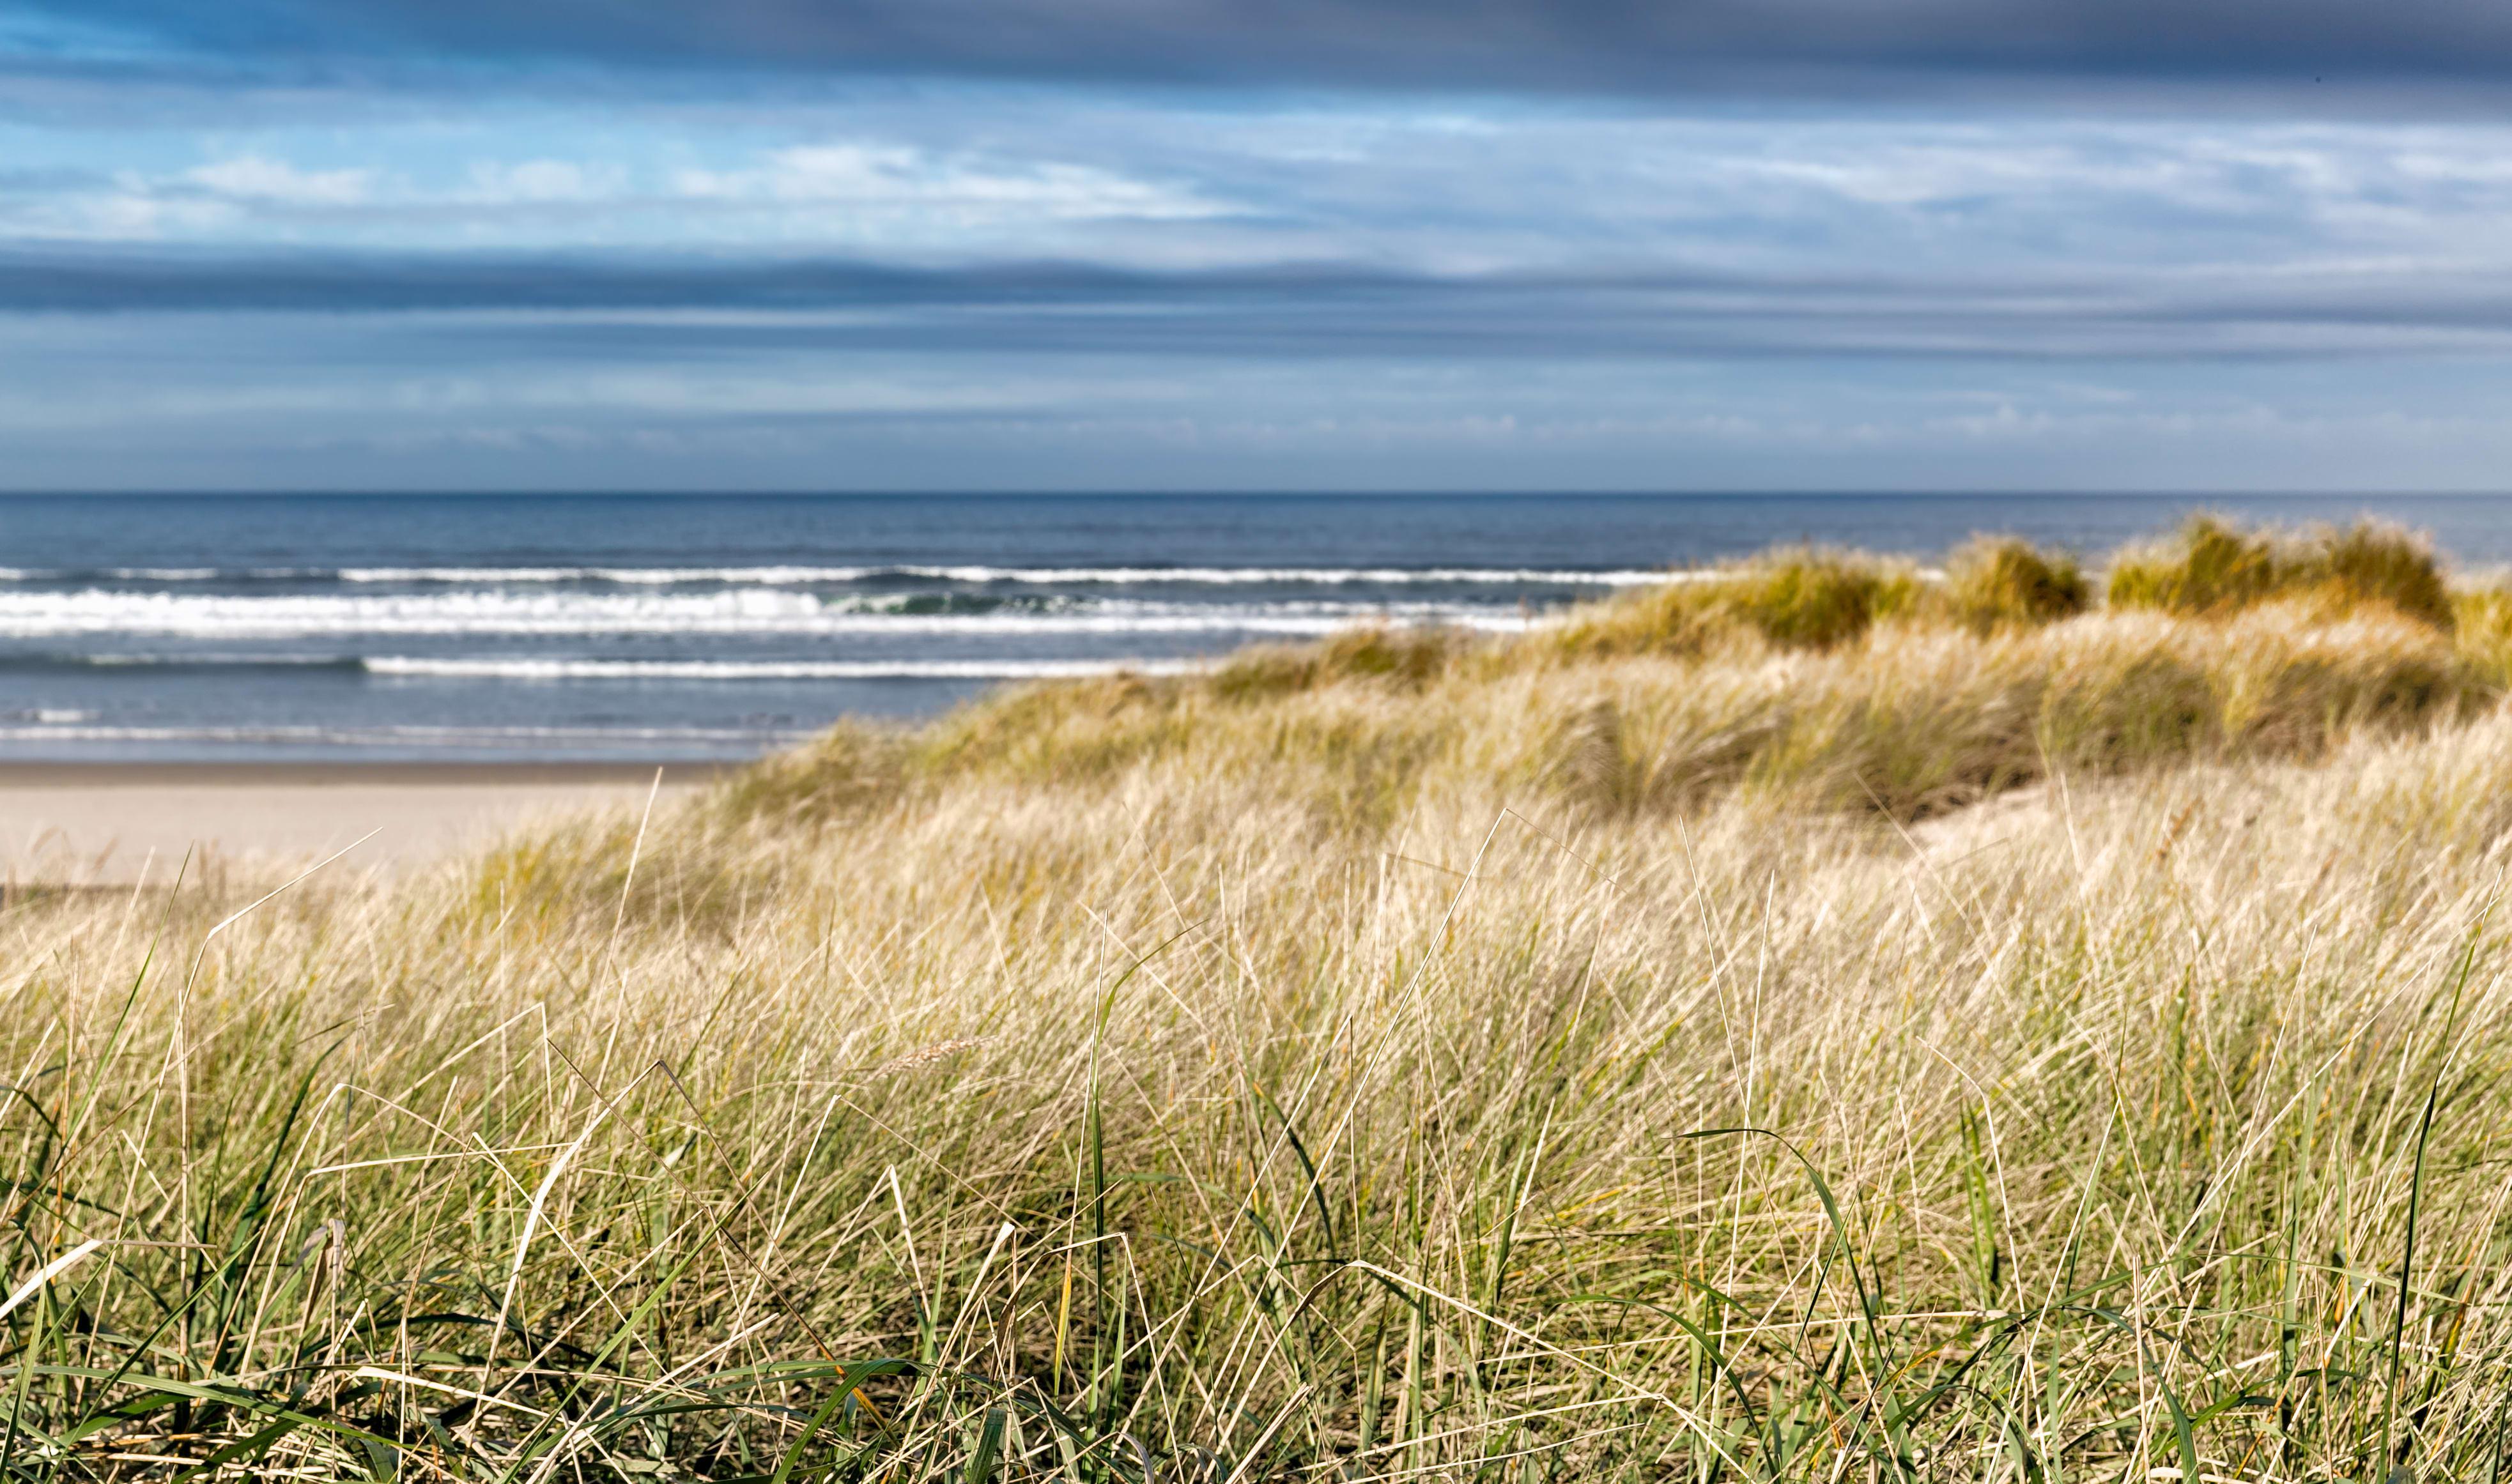 Dune and dune grass at Gearhart beach